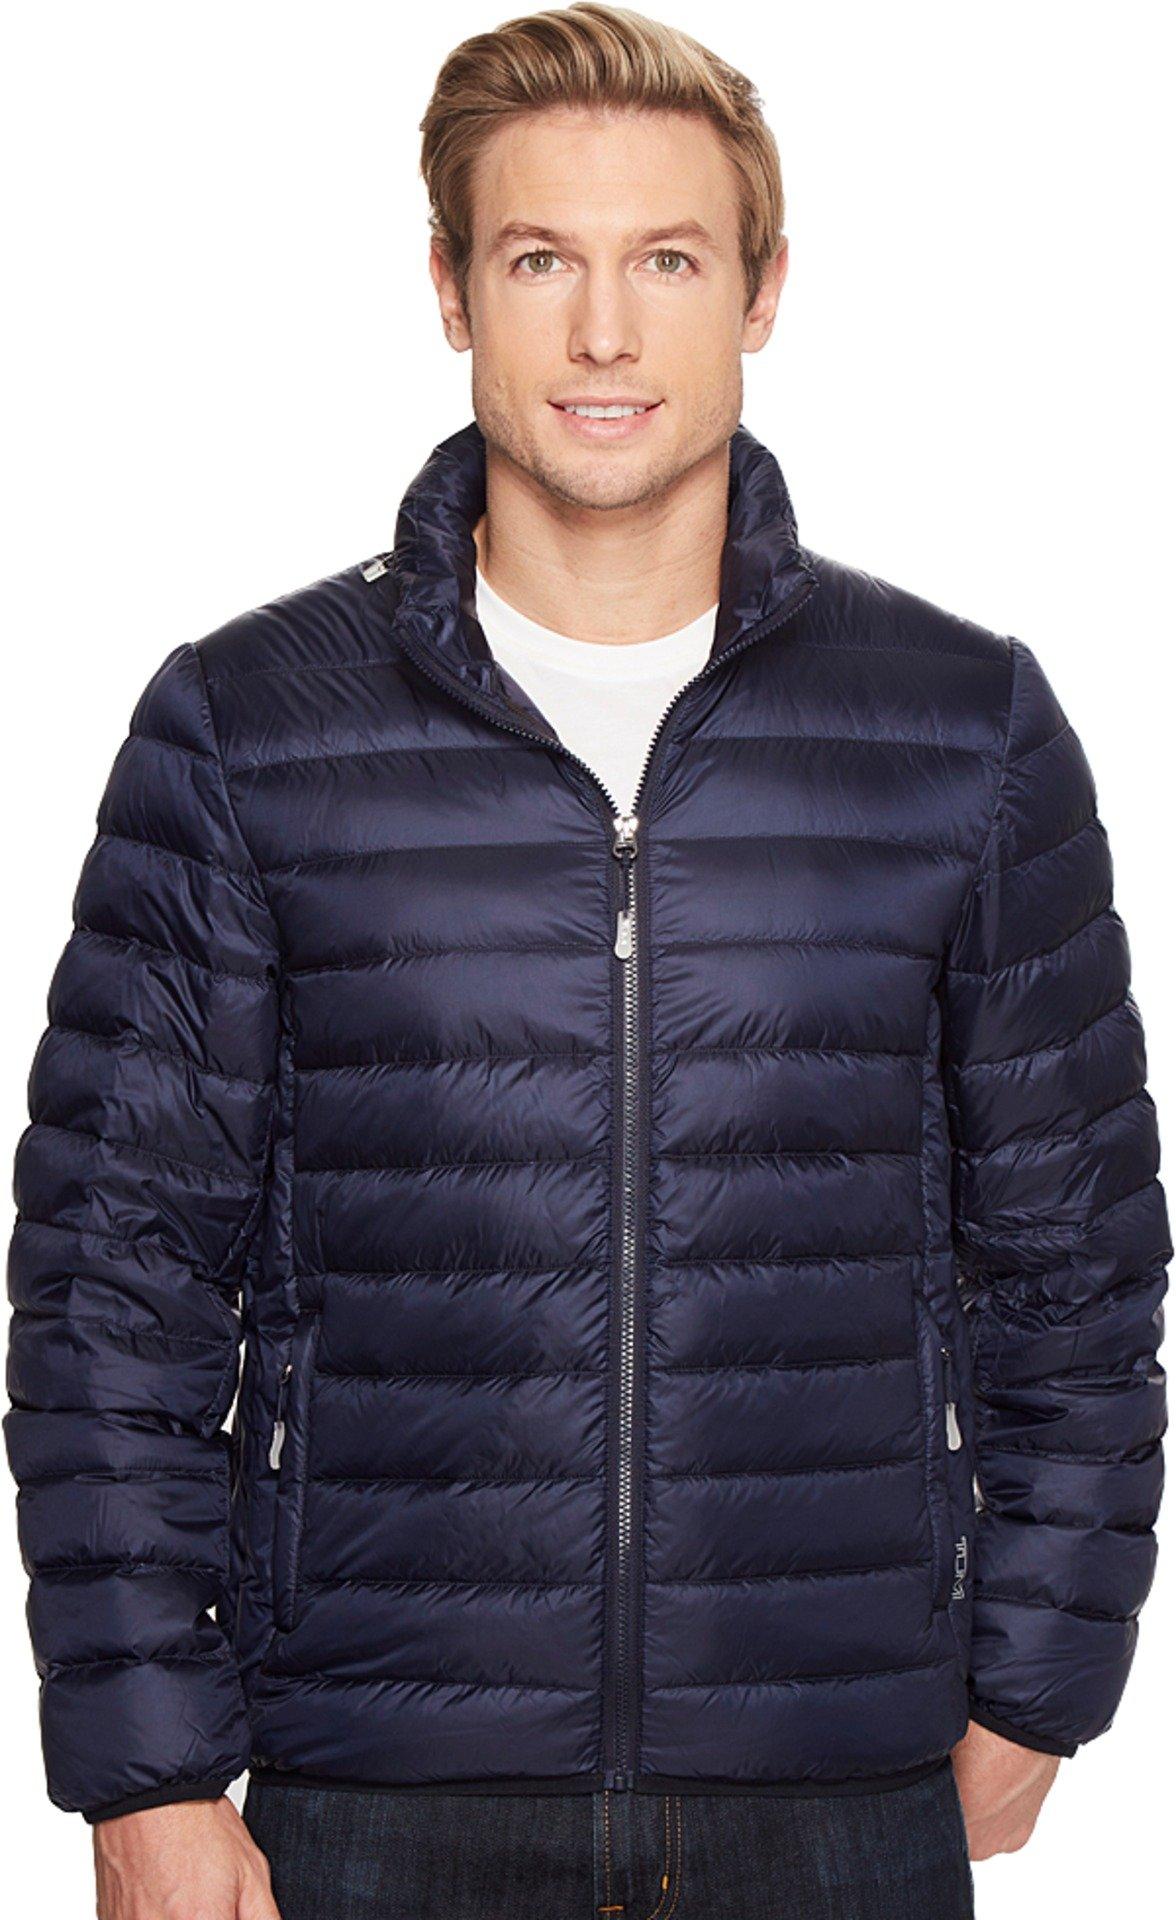 Tumi Men's Patrol Packable Travel Puffer Jacket Navy Outerwear